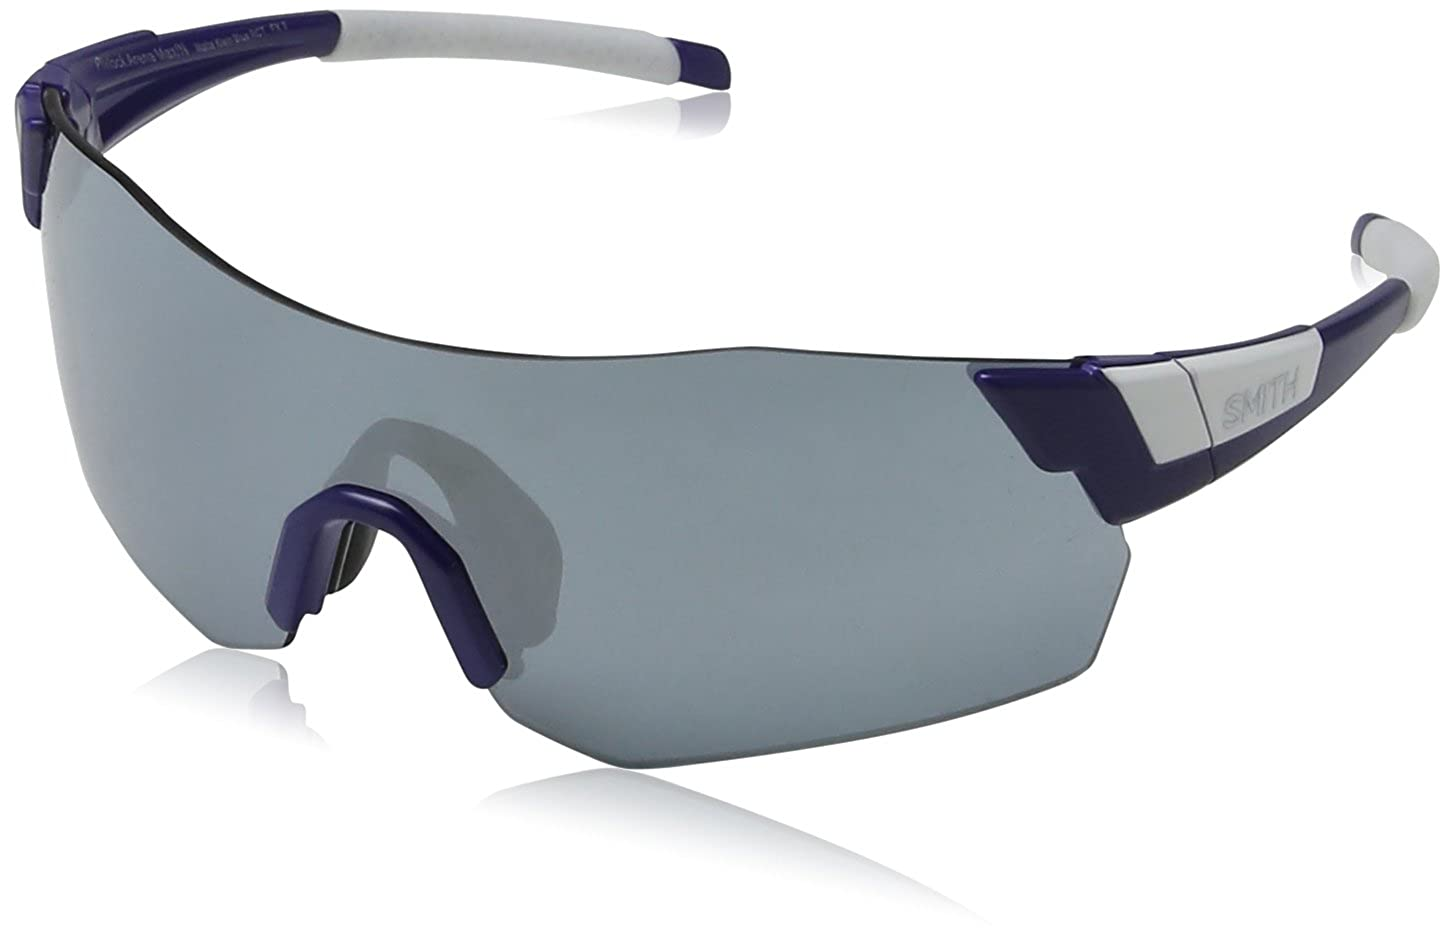 Smith PIVLOCKARE XB RCT 99, Gafas de Sol Unisex Adulto, Azul (Matt Bluee/Slv Silver)